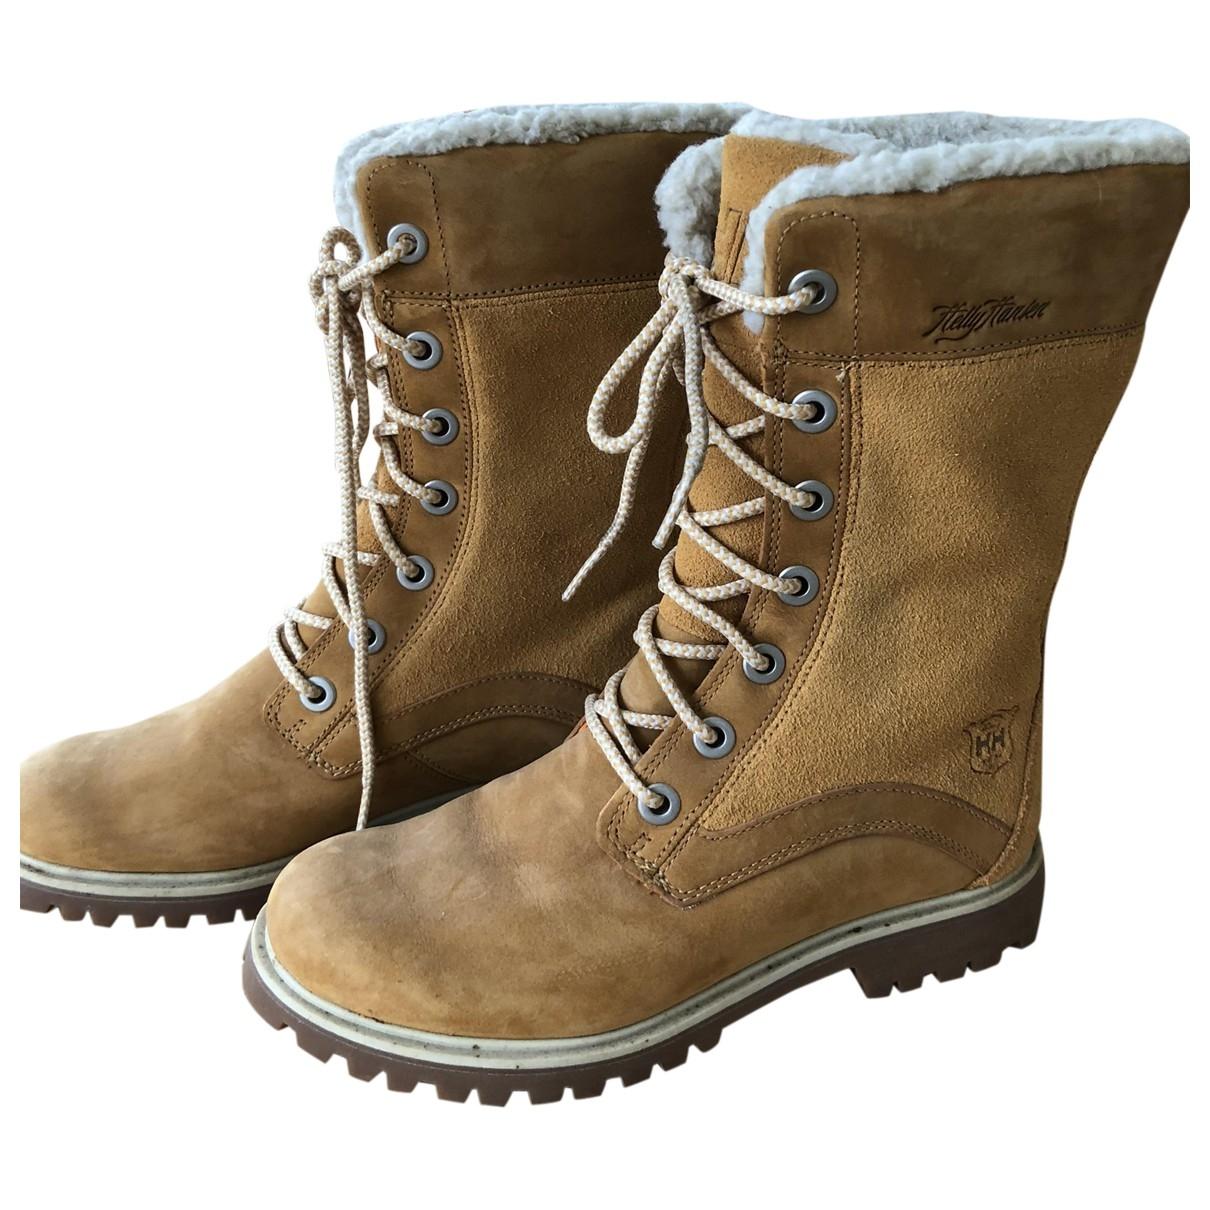 Helly Hansen - Boots   pour femme en cuir - beige